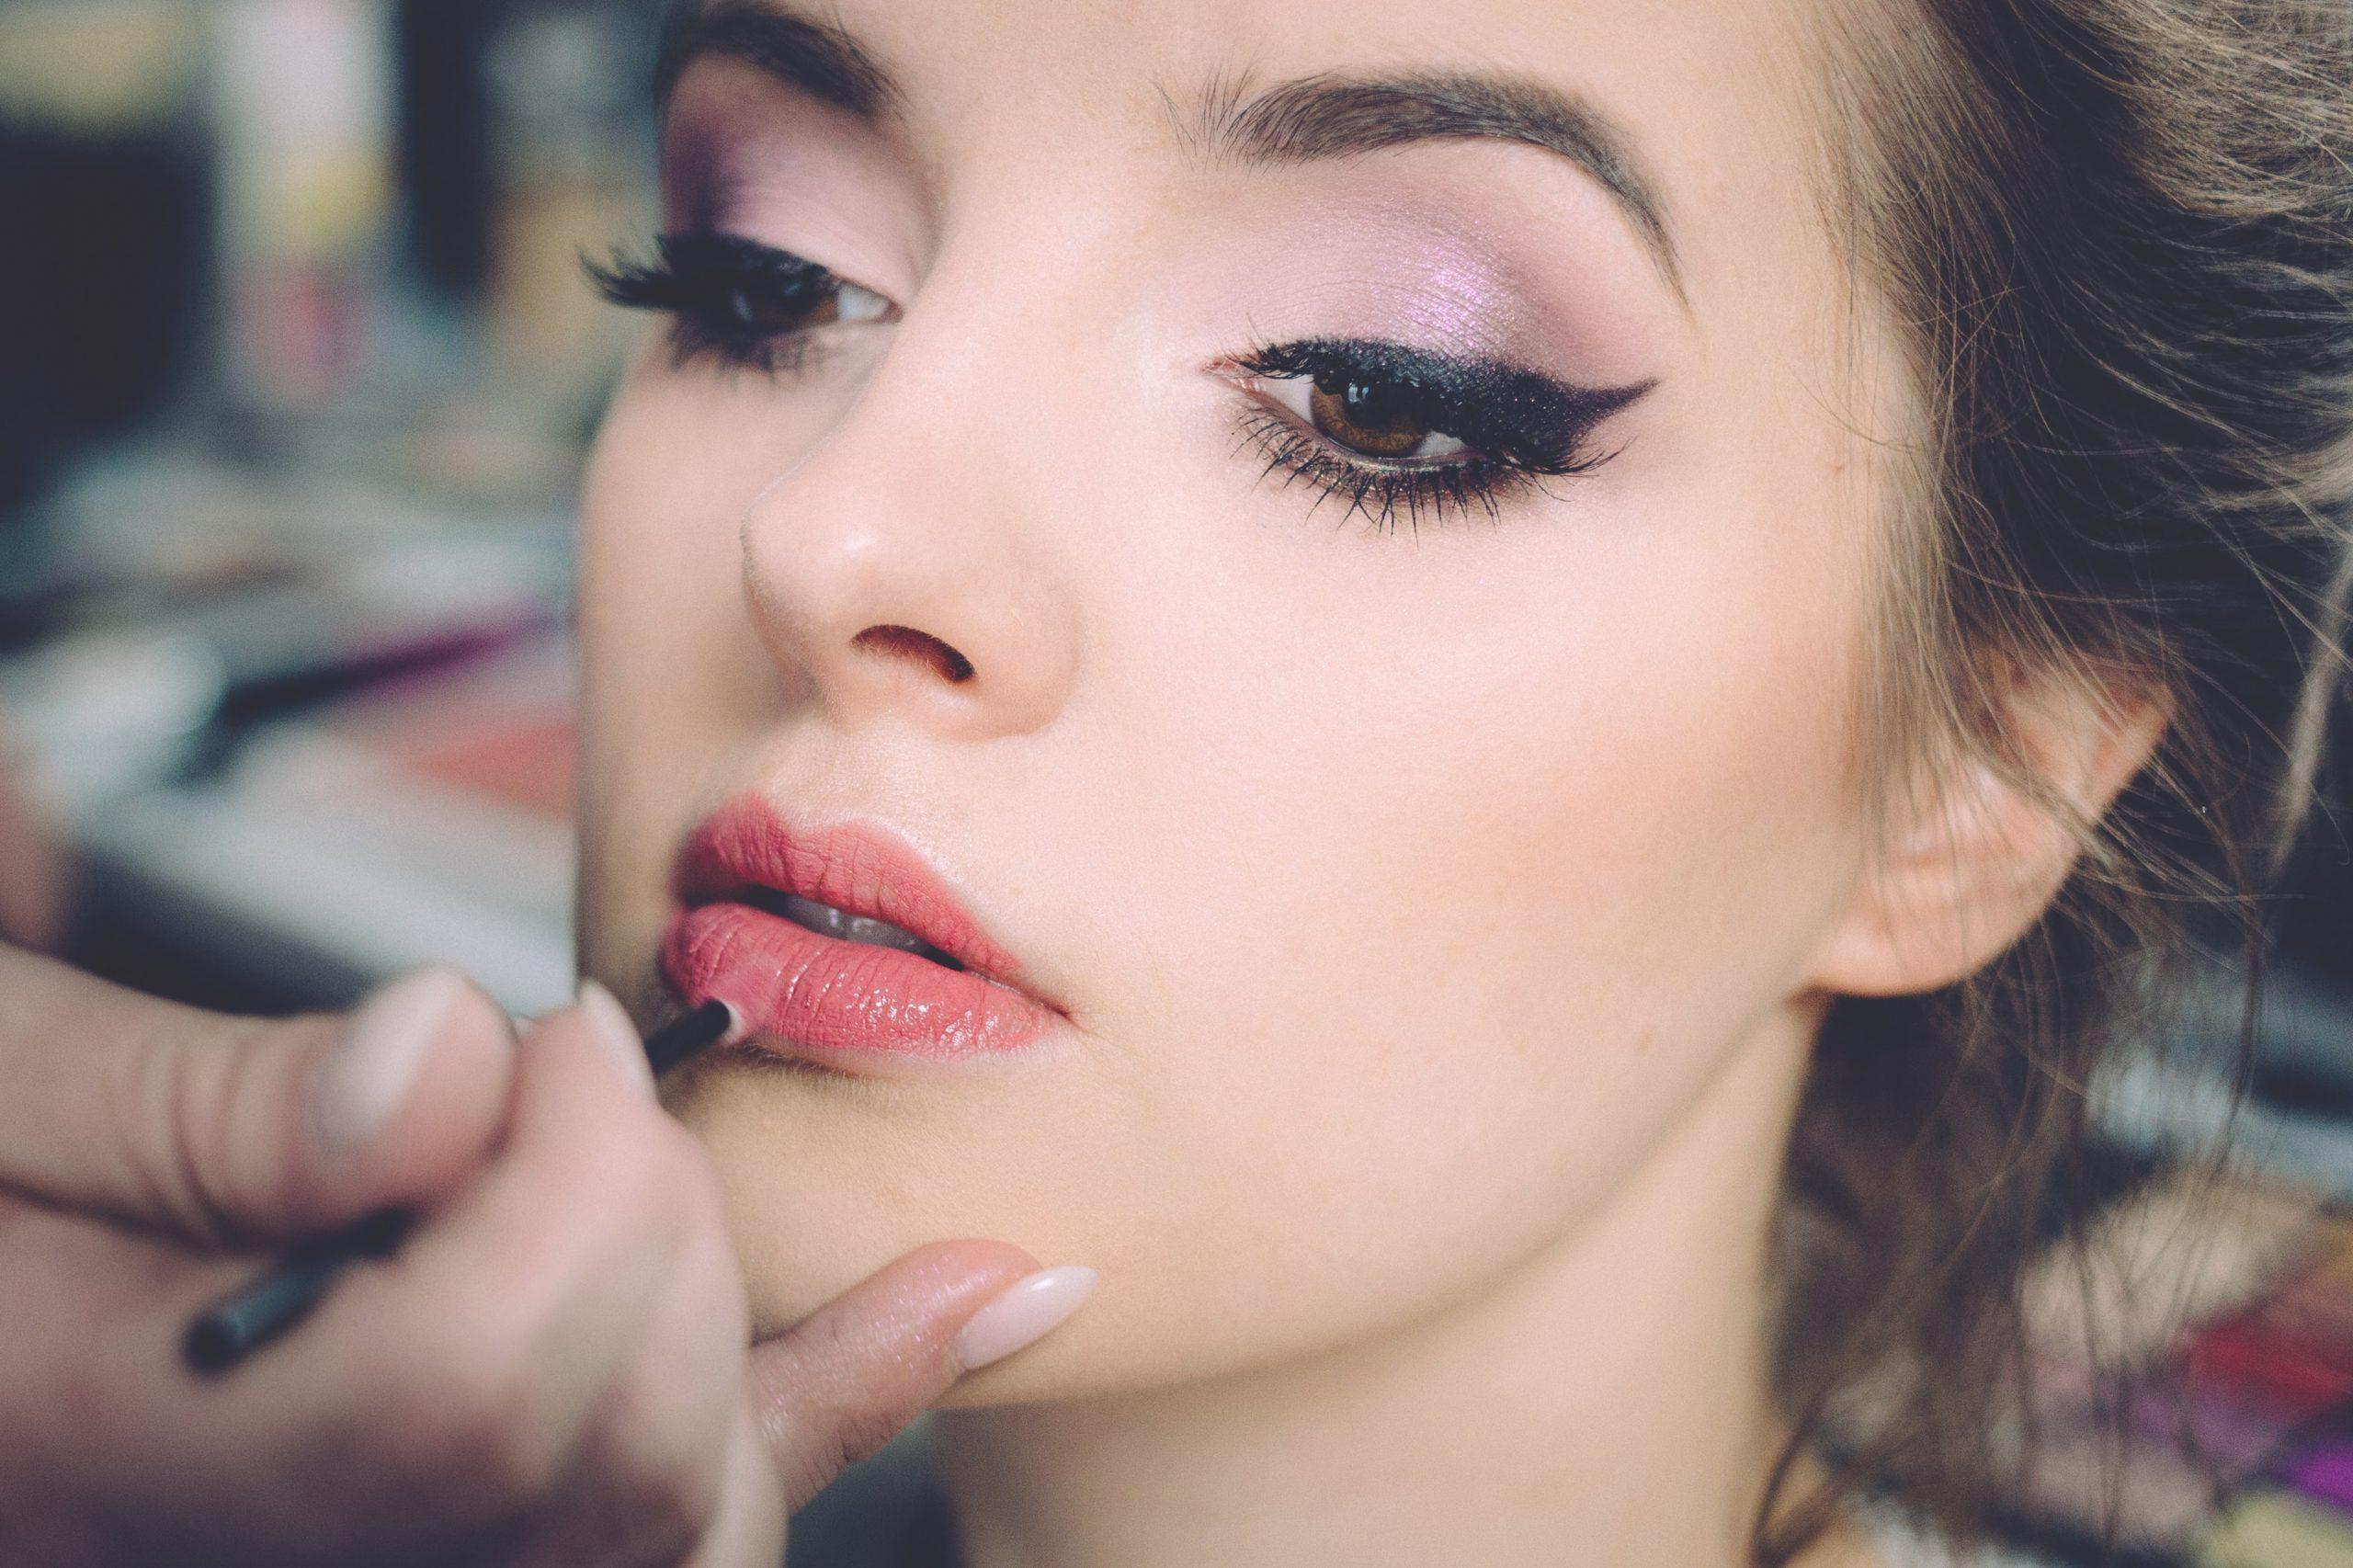 Mujer aplicándole lápiz labial